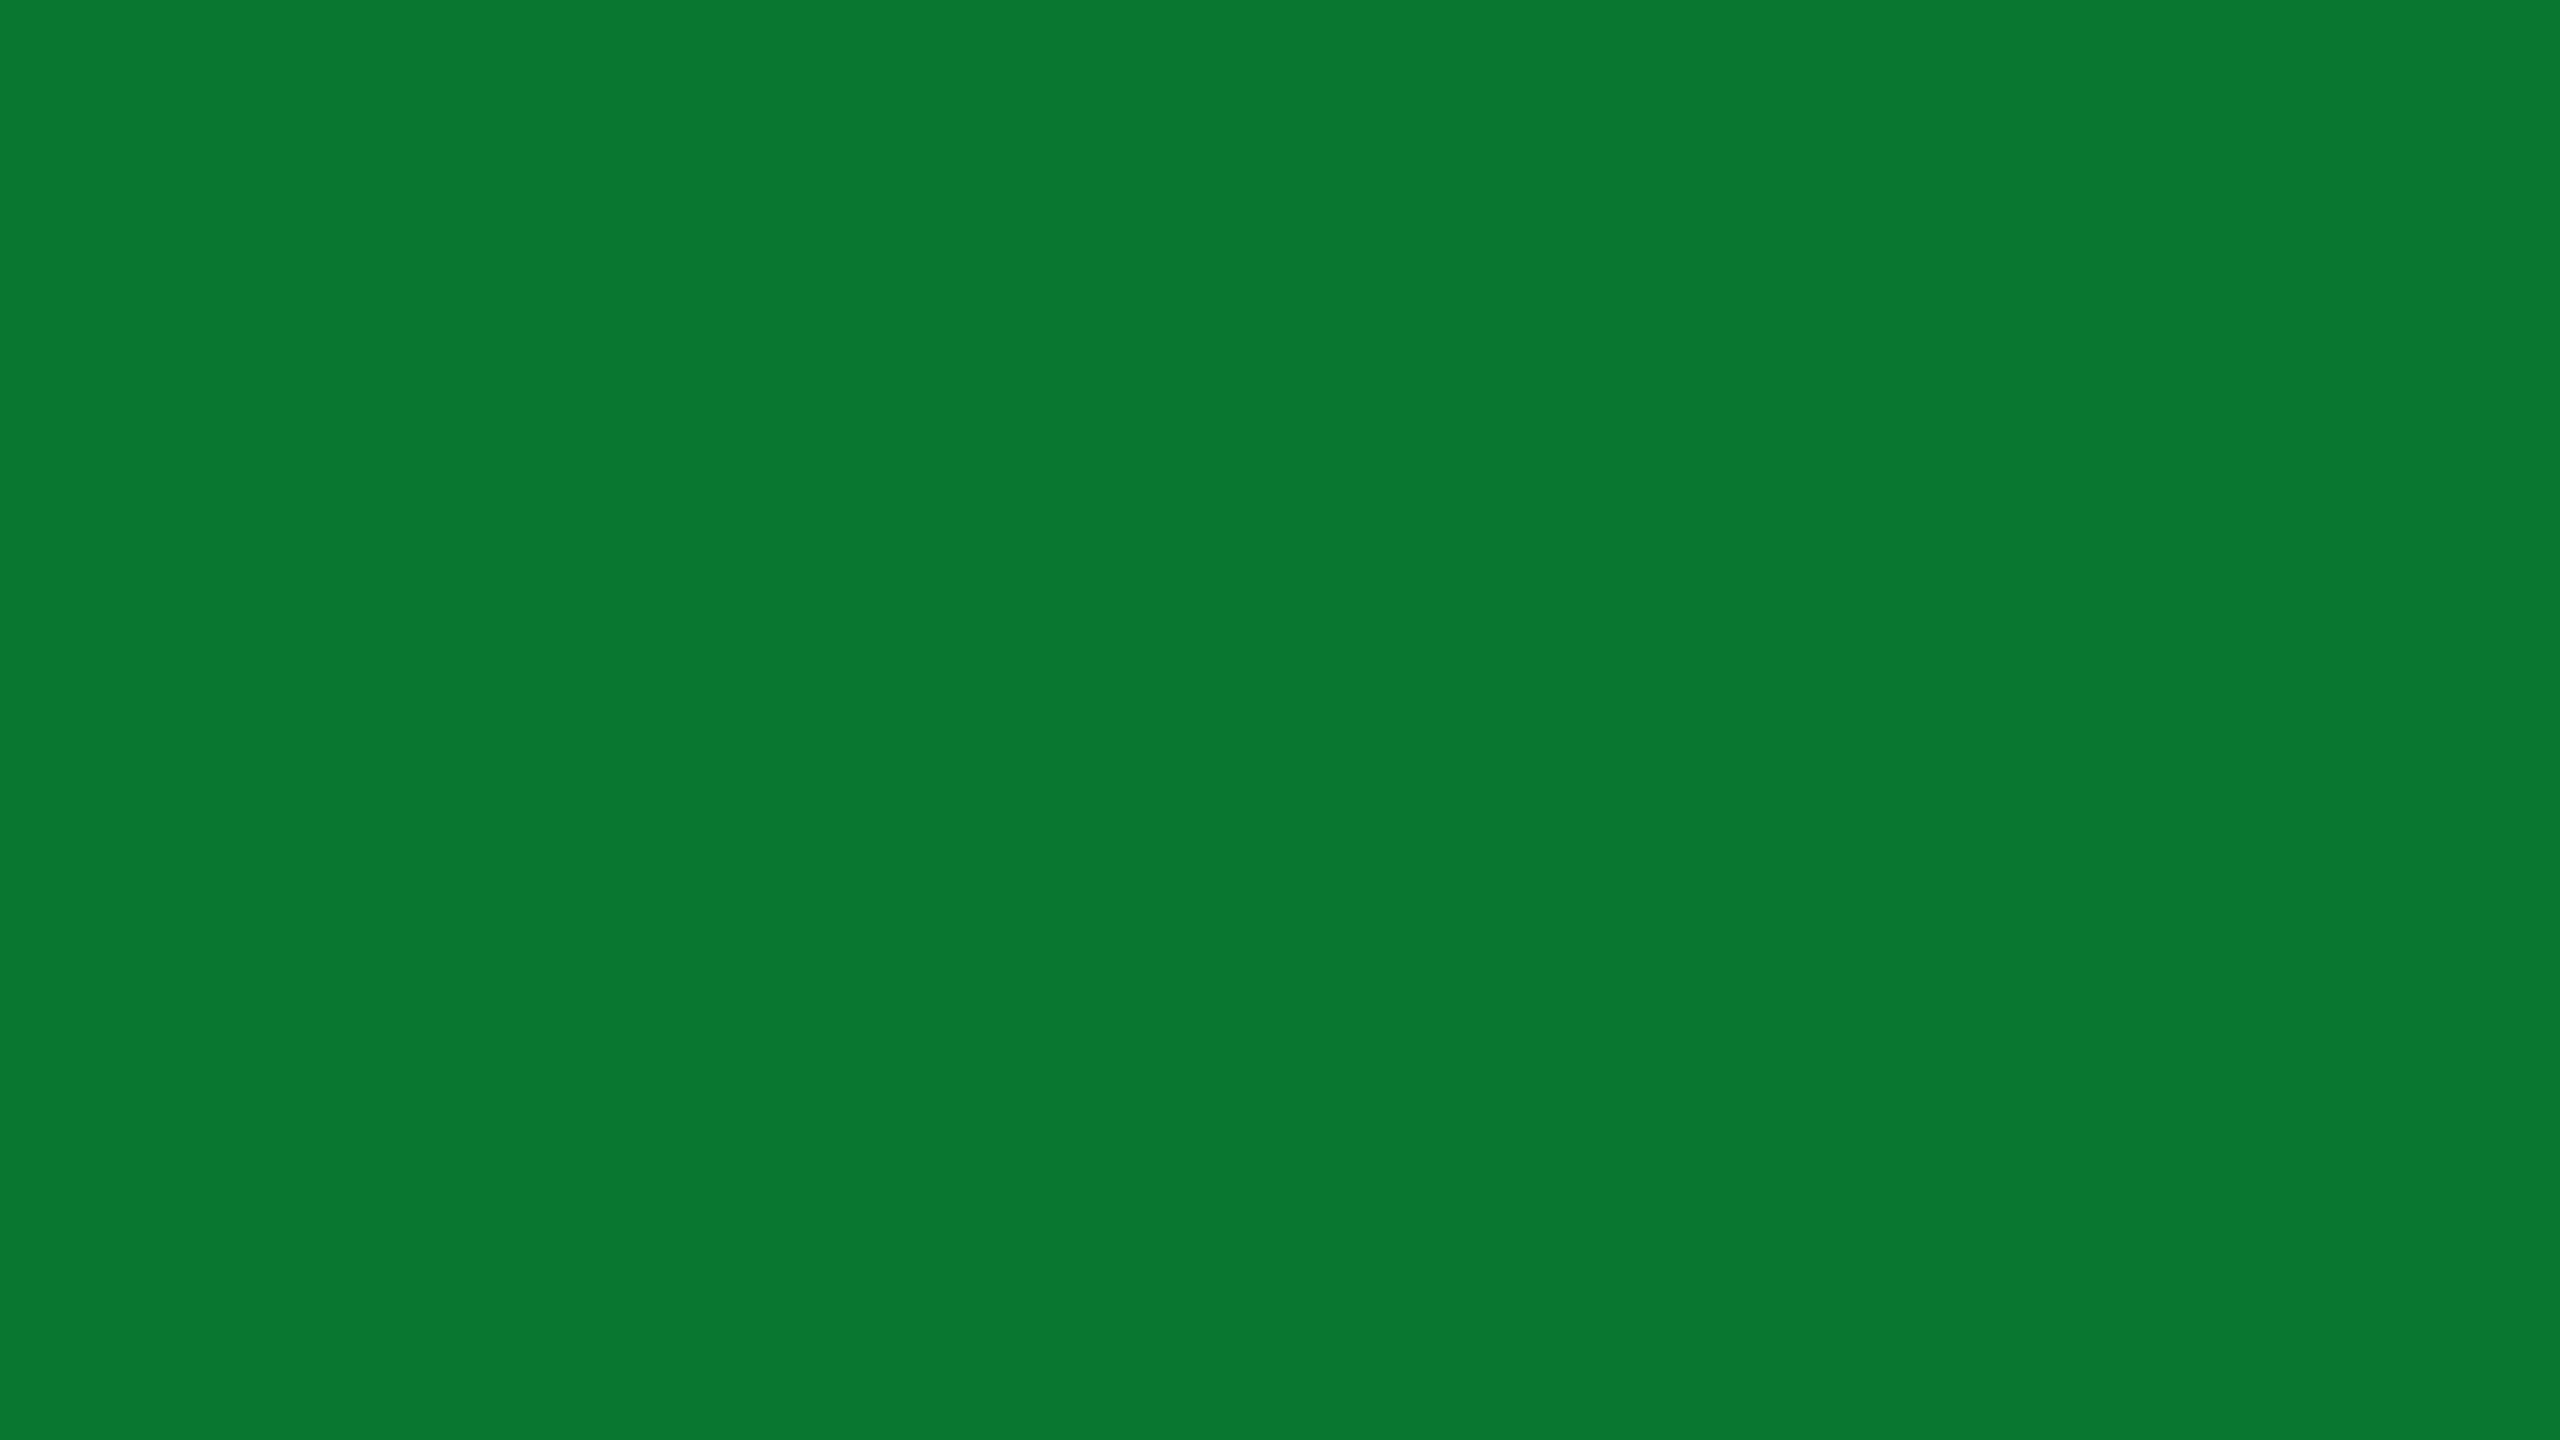 Plain colored wallpaper wallpapersafari - Plain green background ...